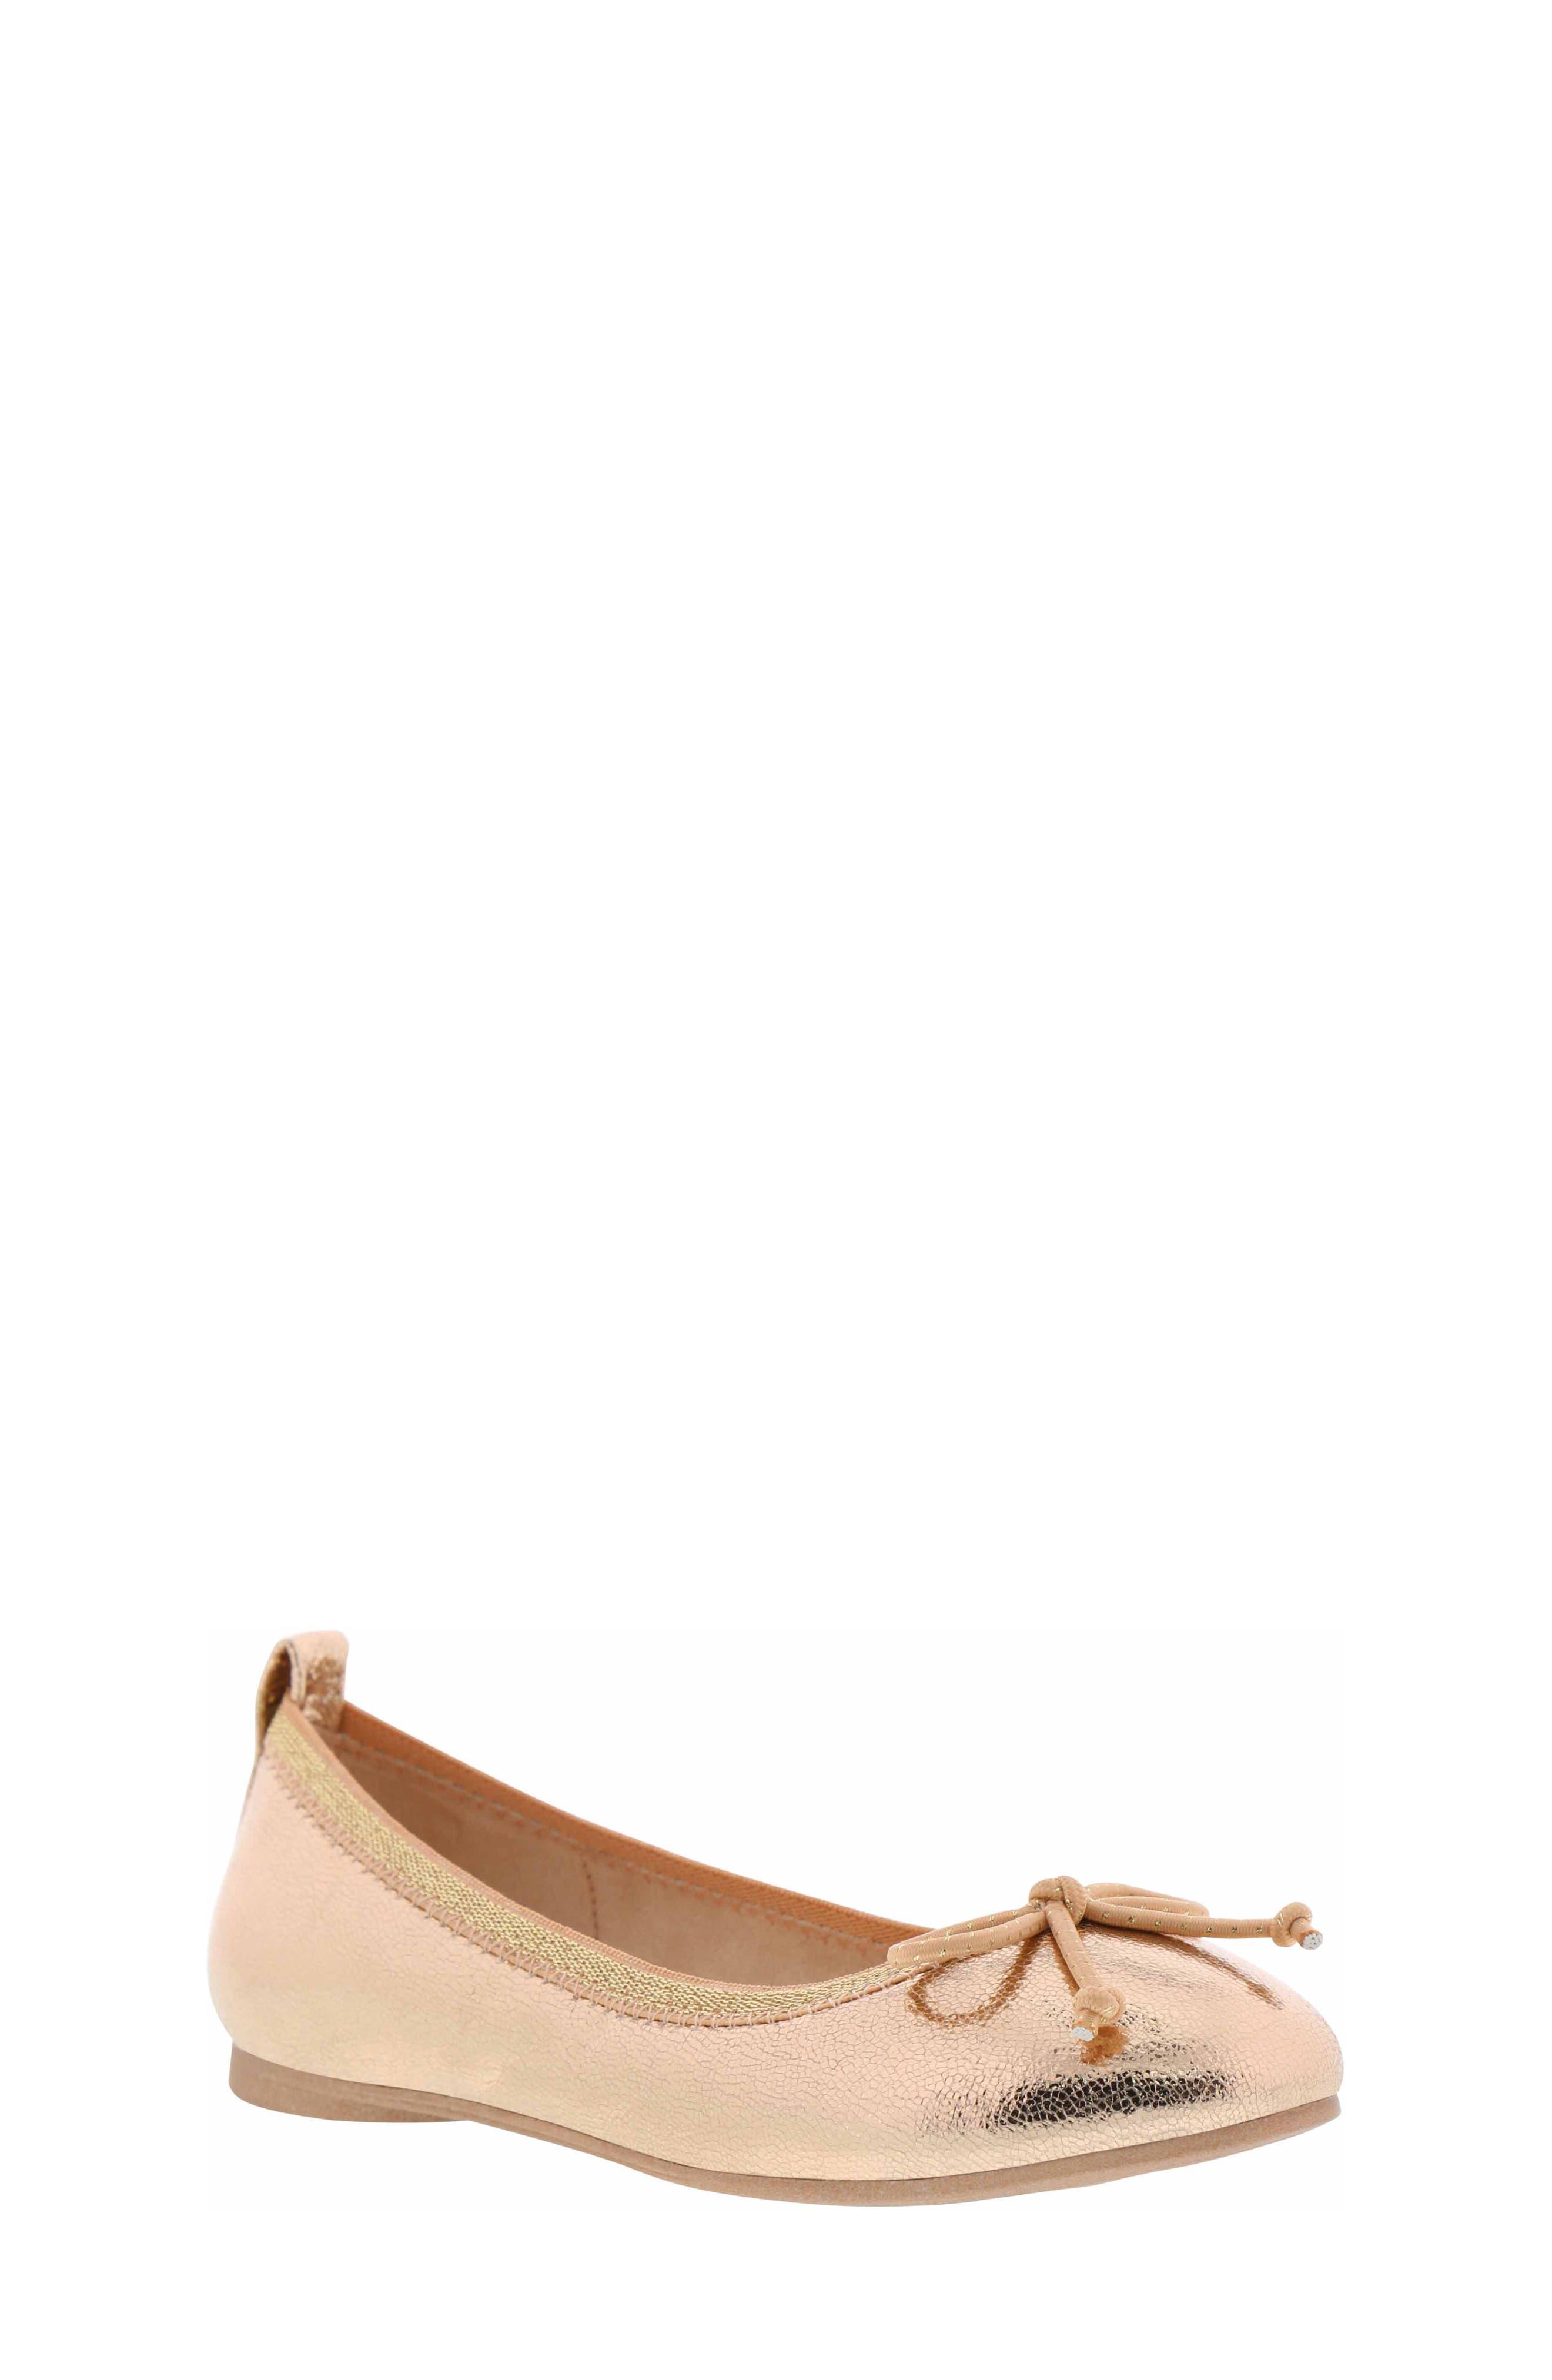 REACTION KENNETH COLE Copy Tap Ballet Flat, Main, color, ROSE METALLIC